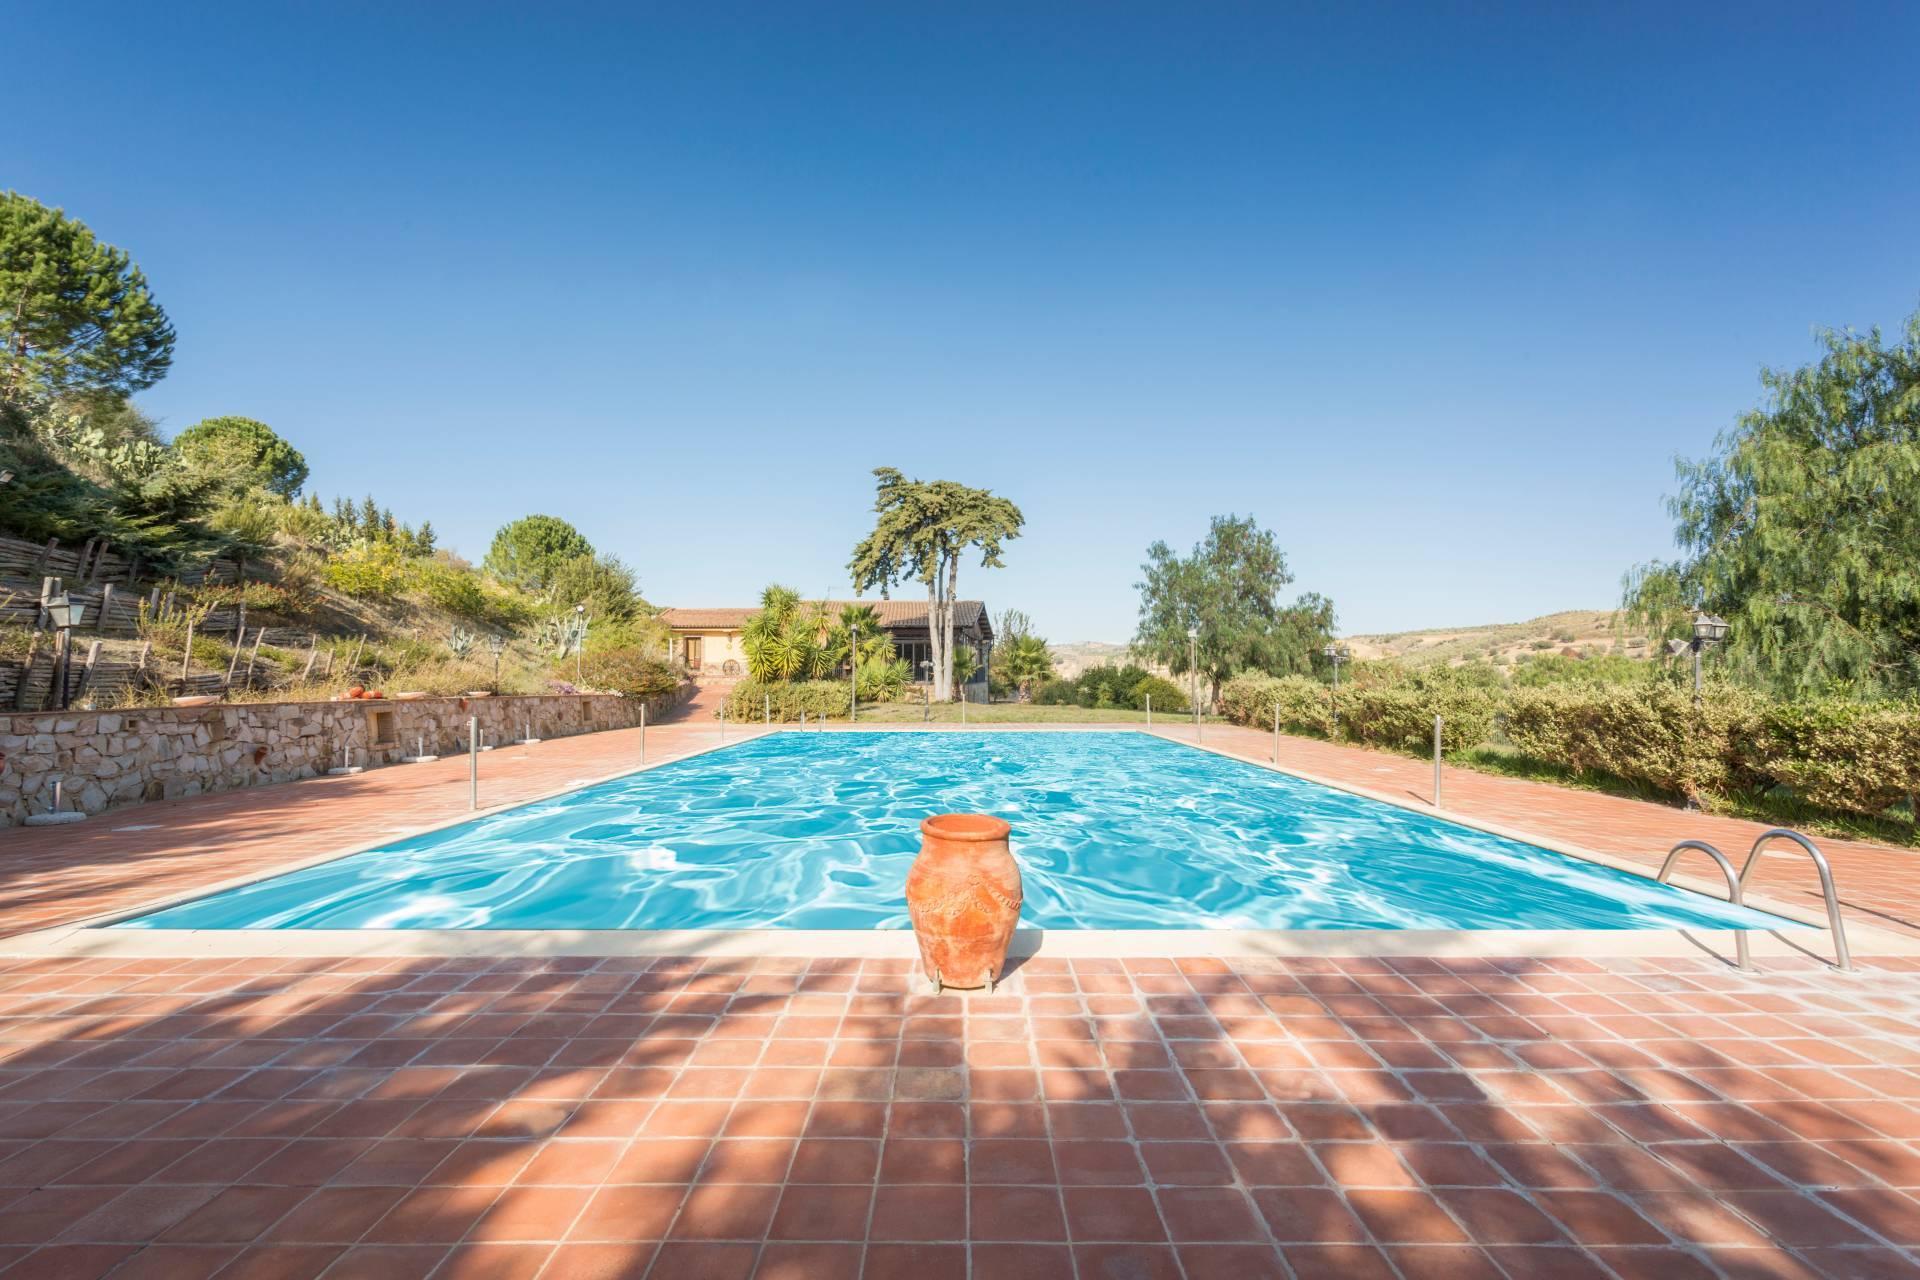 Villa in Vendita a Piazza Armerina: 5 locali, 550 mq - Foto 8